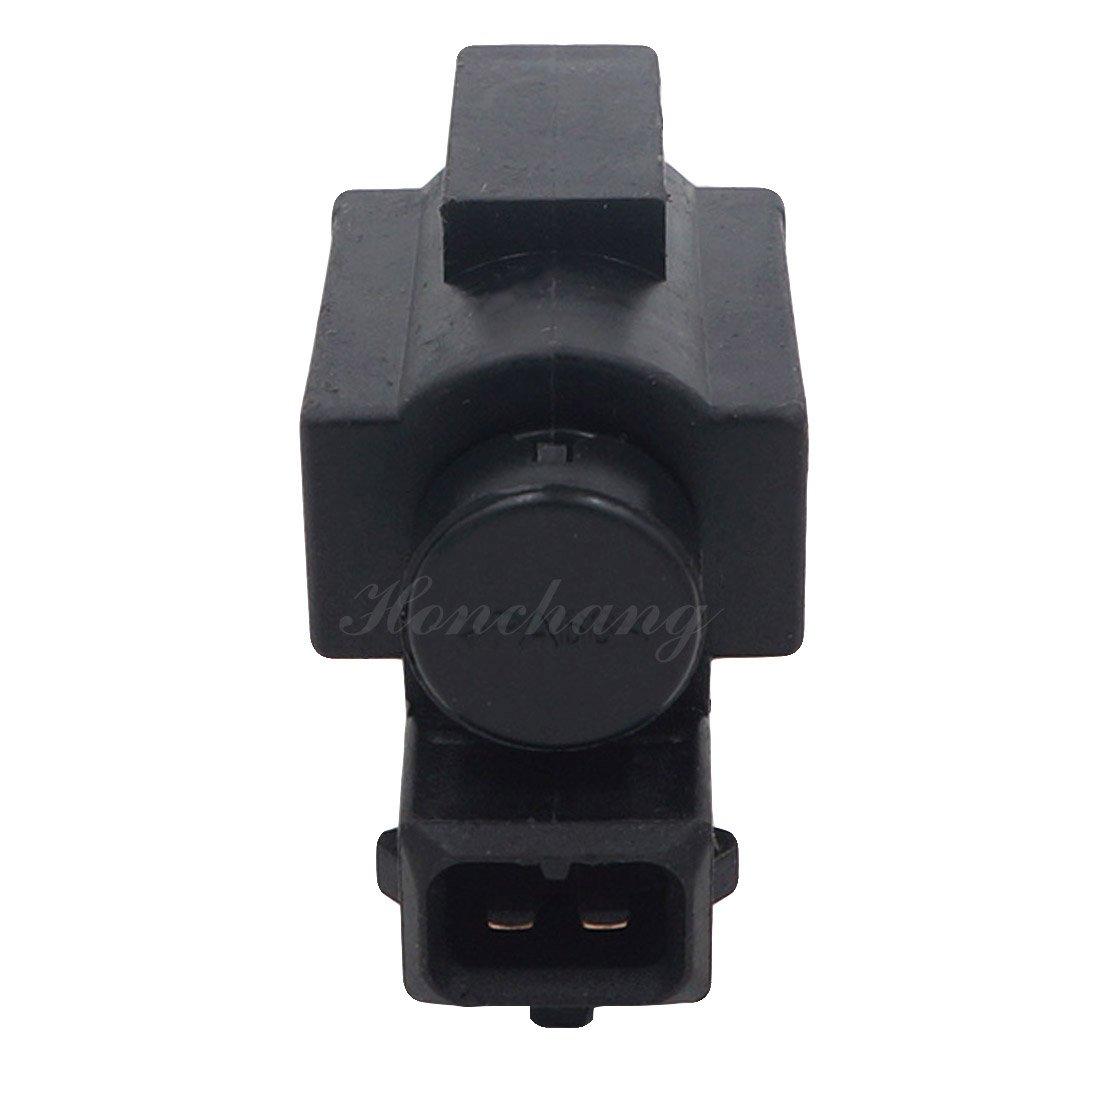 honchang Válvula de solenoide Turbo Control para BMW E36 E39 E46 330i 530i 535i 750i M5 X3 7810831: Amazon.es: Coche y moto